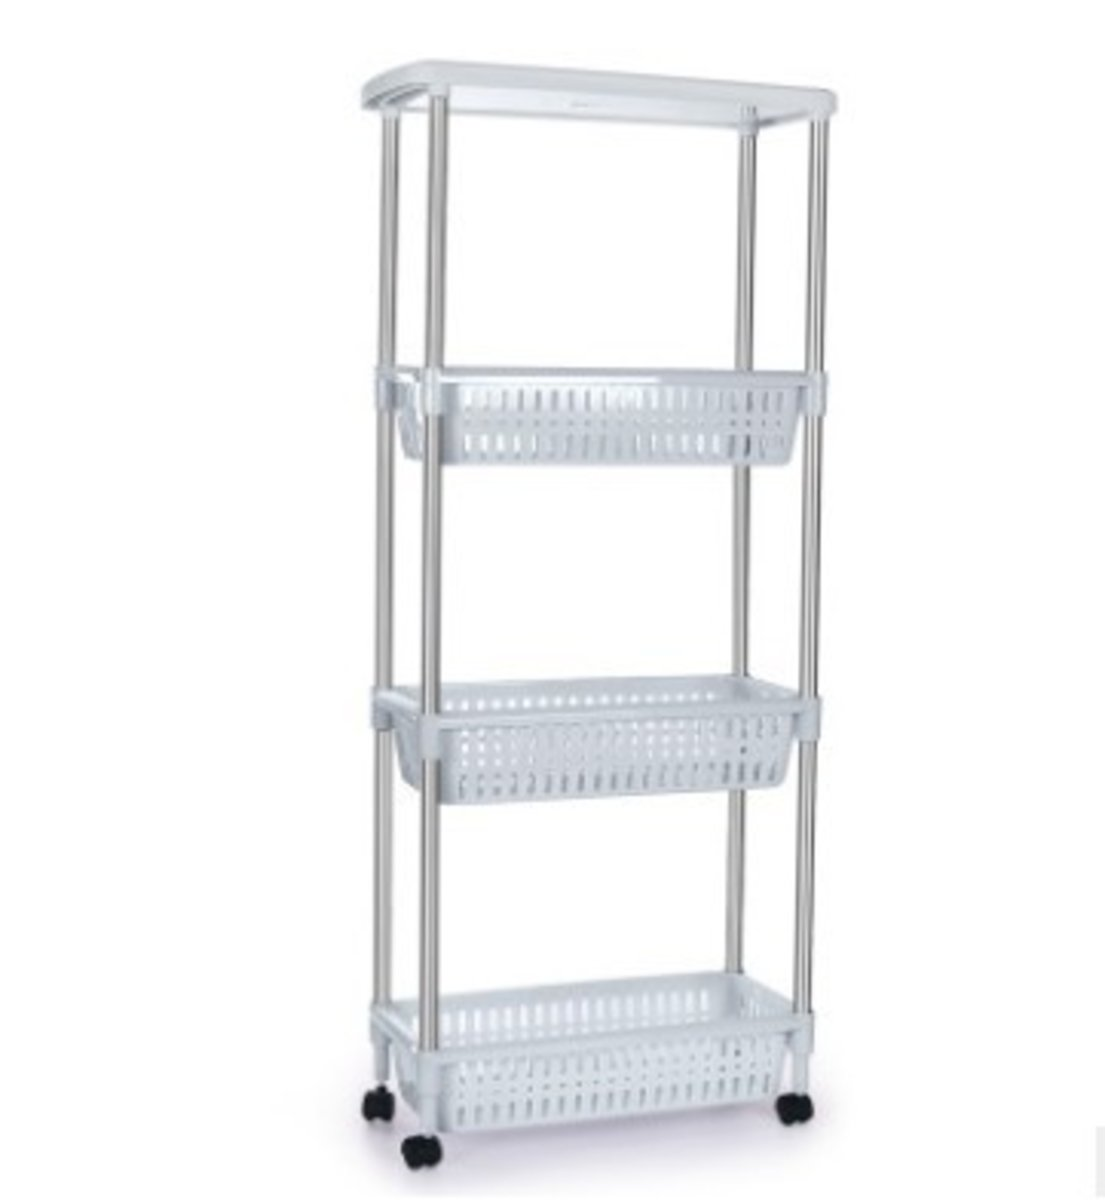 Movable shelf (4 layers)